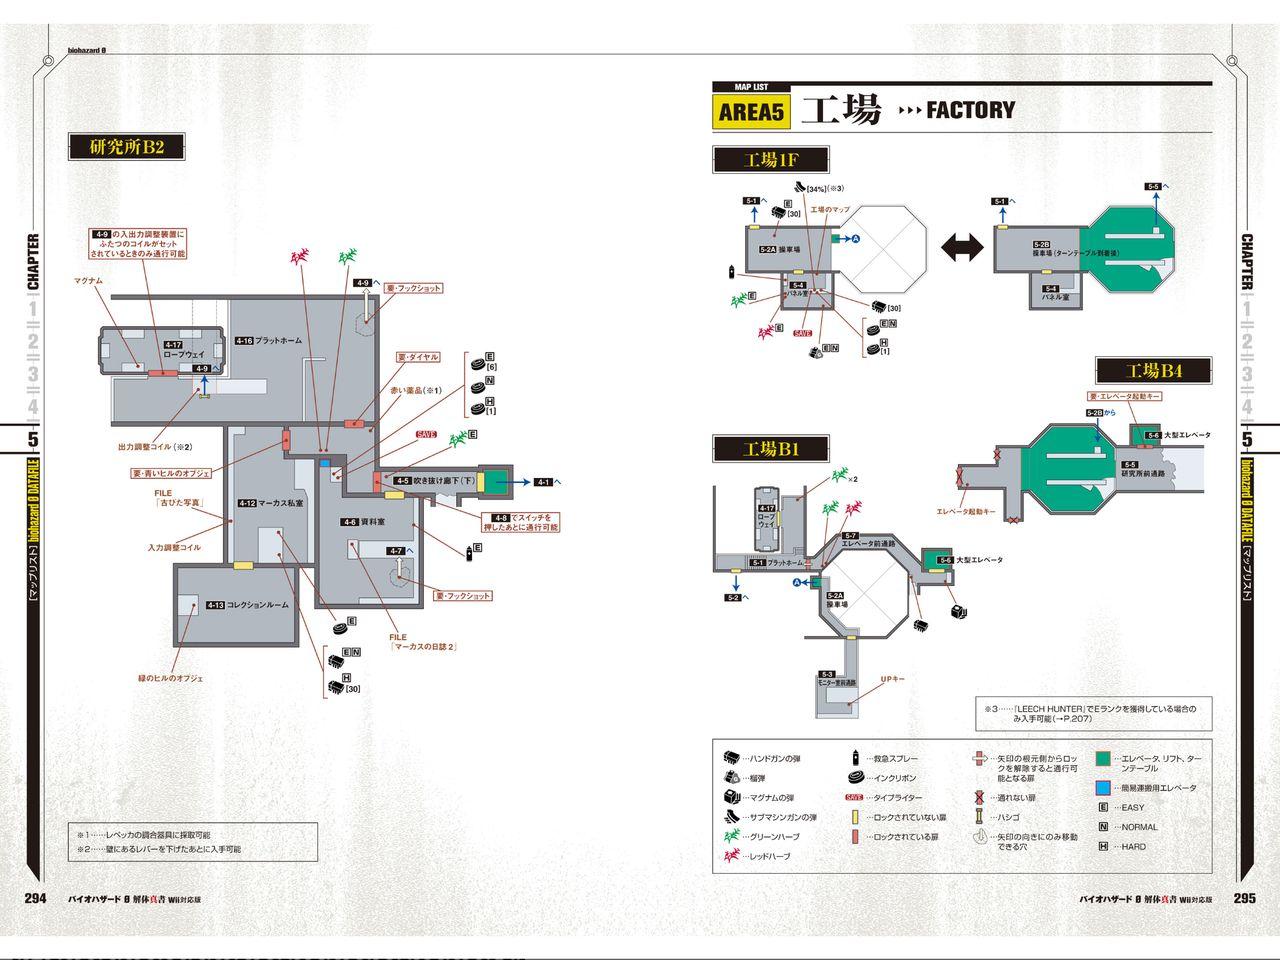 Laboratory/Hallway atrium (lower)